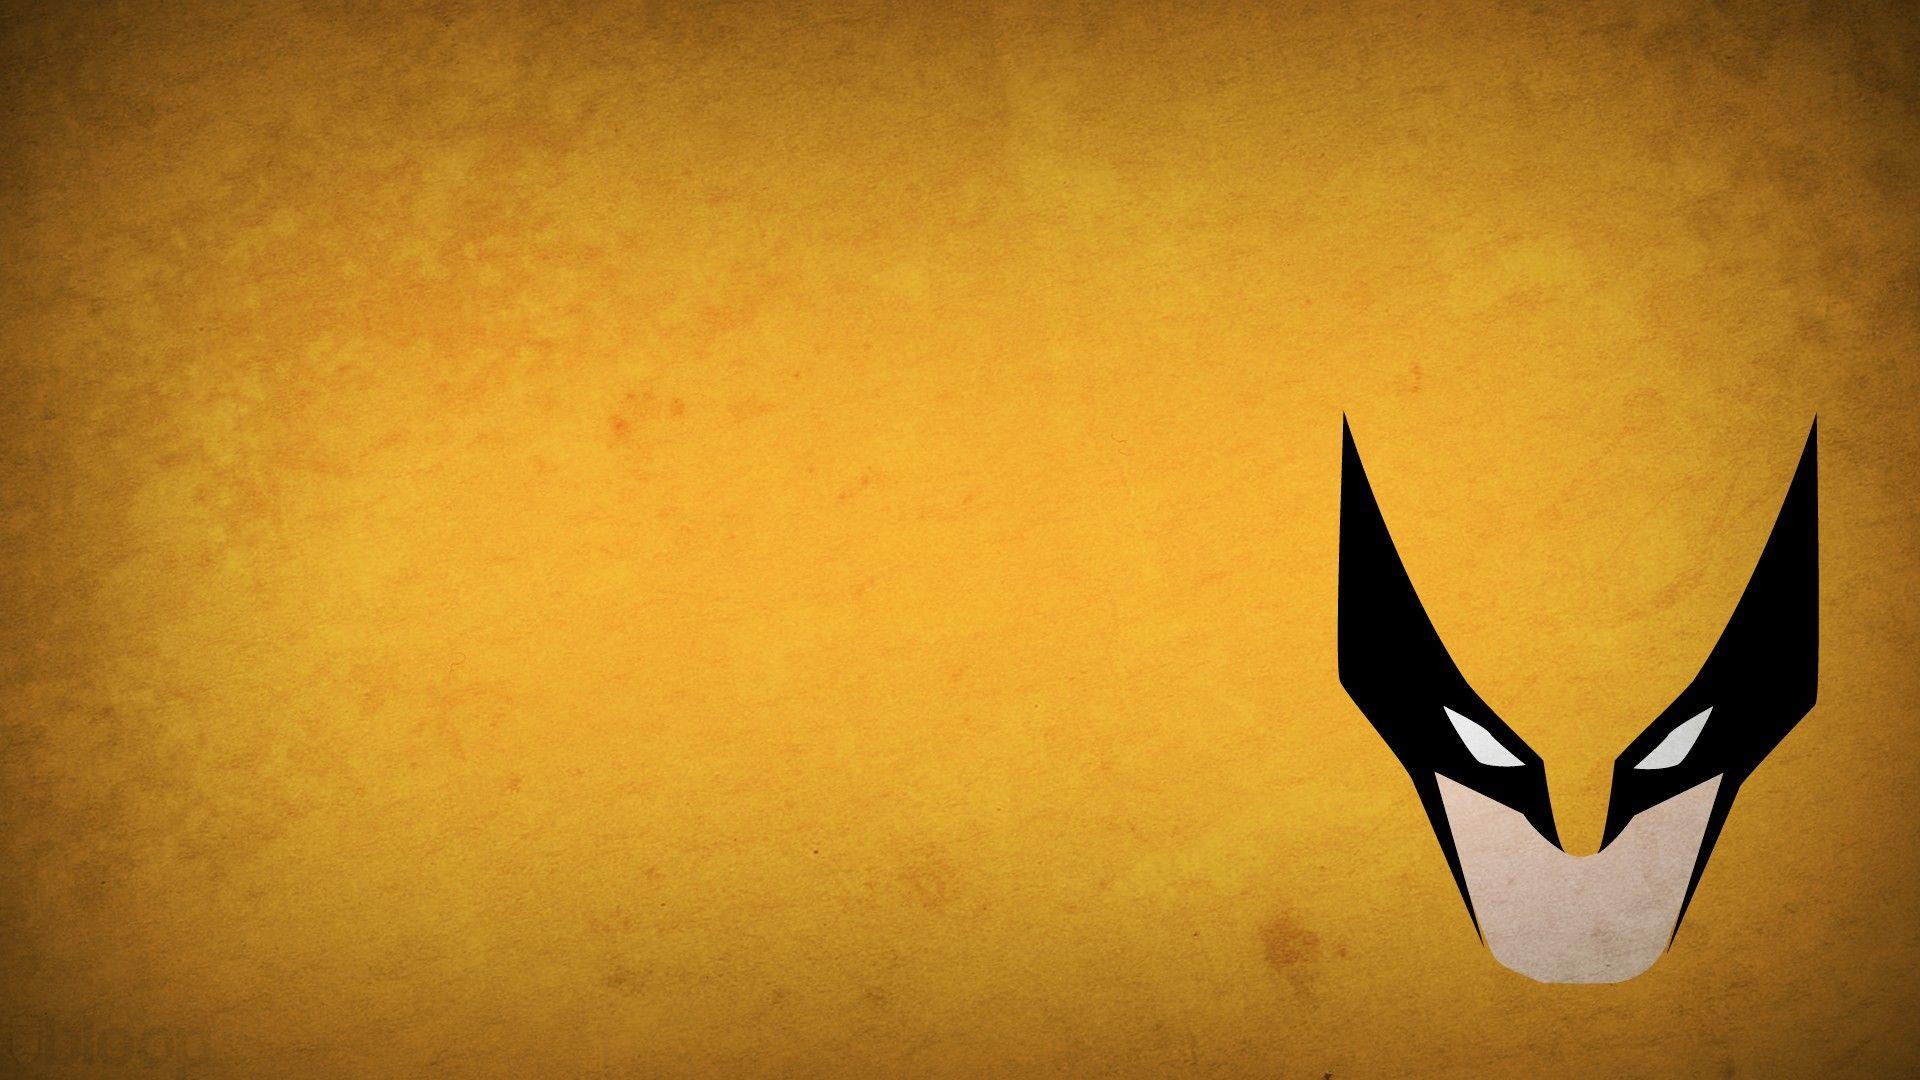 Minimalistic X Men Wolverine Superheroes Marvel Comics Yellow Background Blo0p Wallpaper 1868988 Wallb Superhero Wallpaper Dc Comics Wallpaper Wolverine